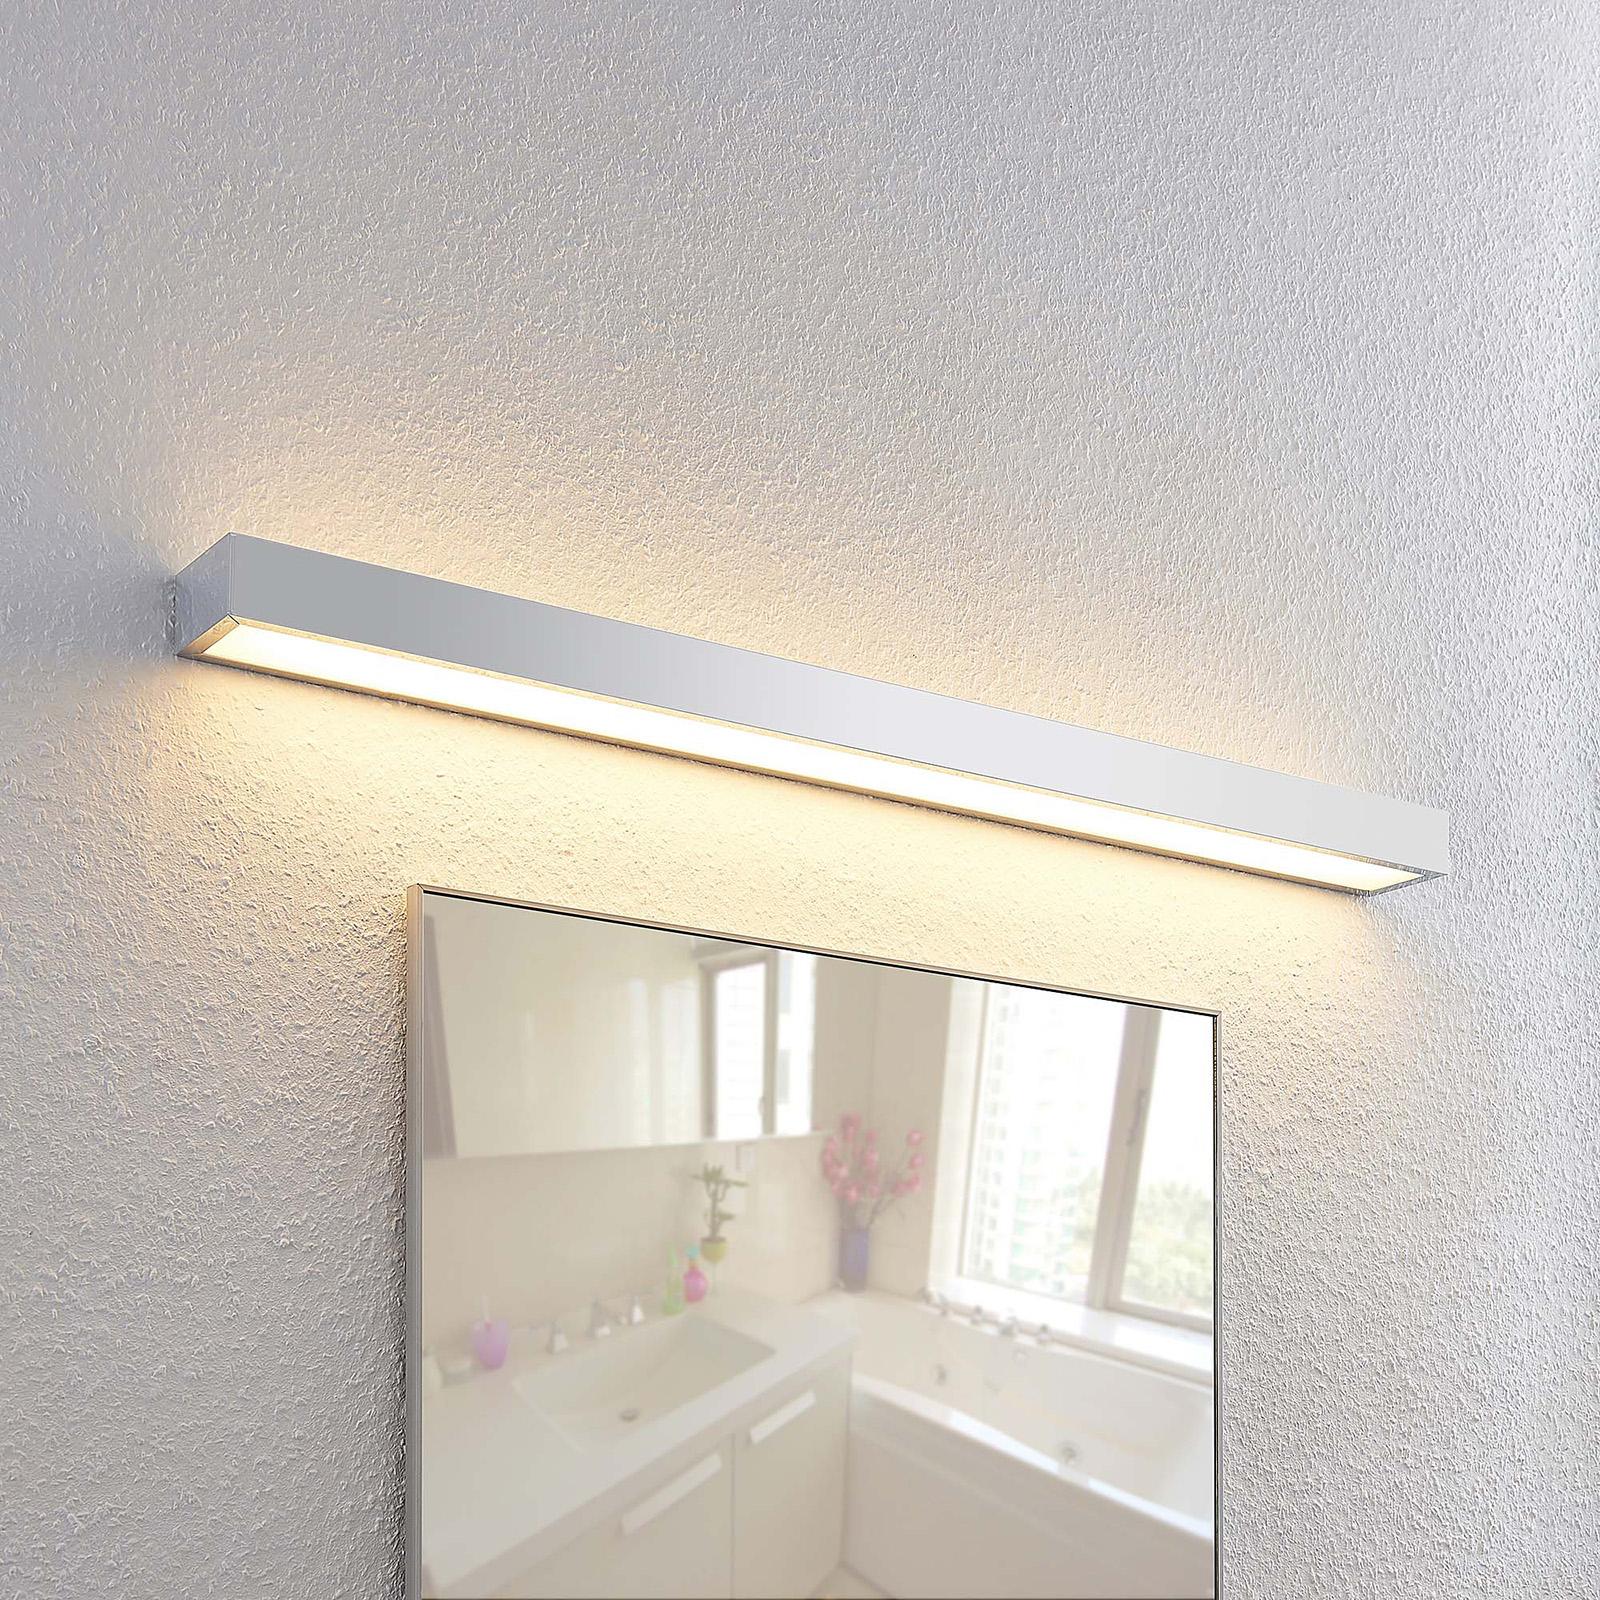 Acquista Lindby Layan applique LED per il bagno cromo 90 cm